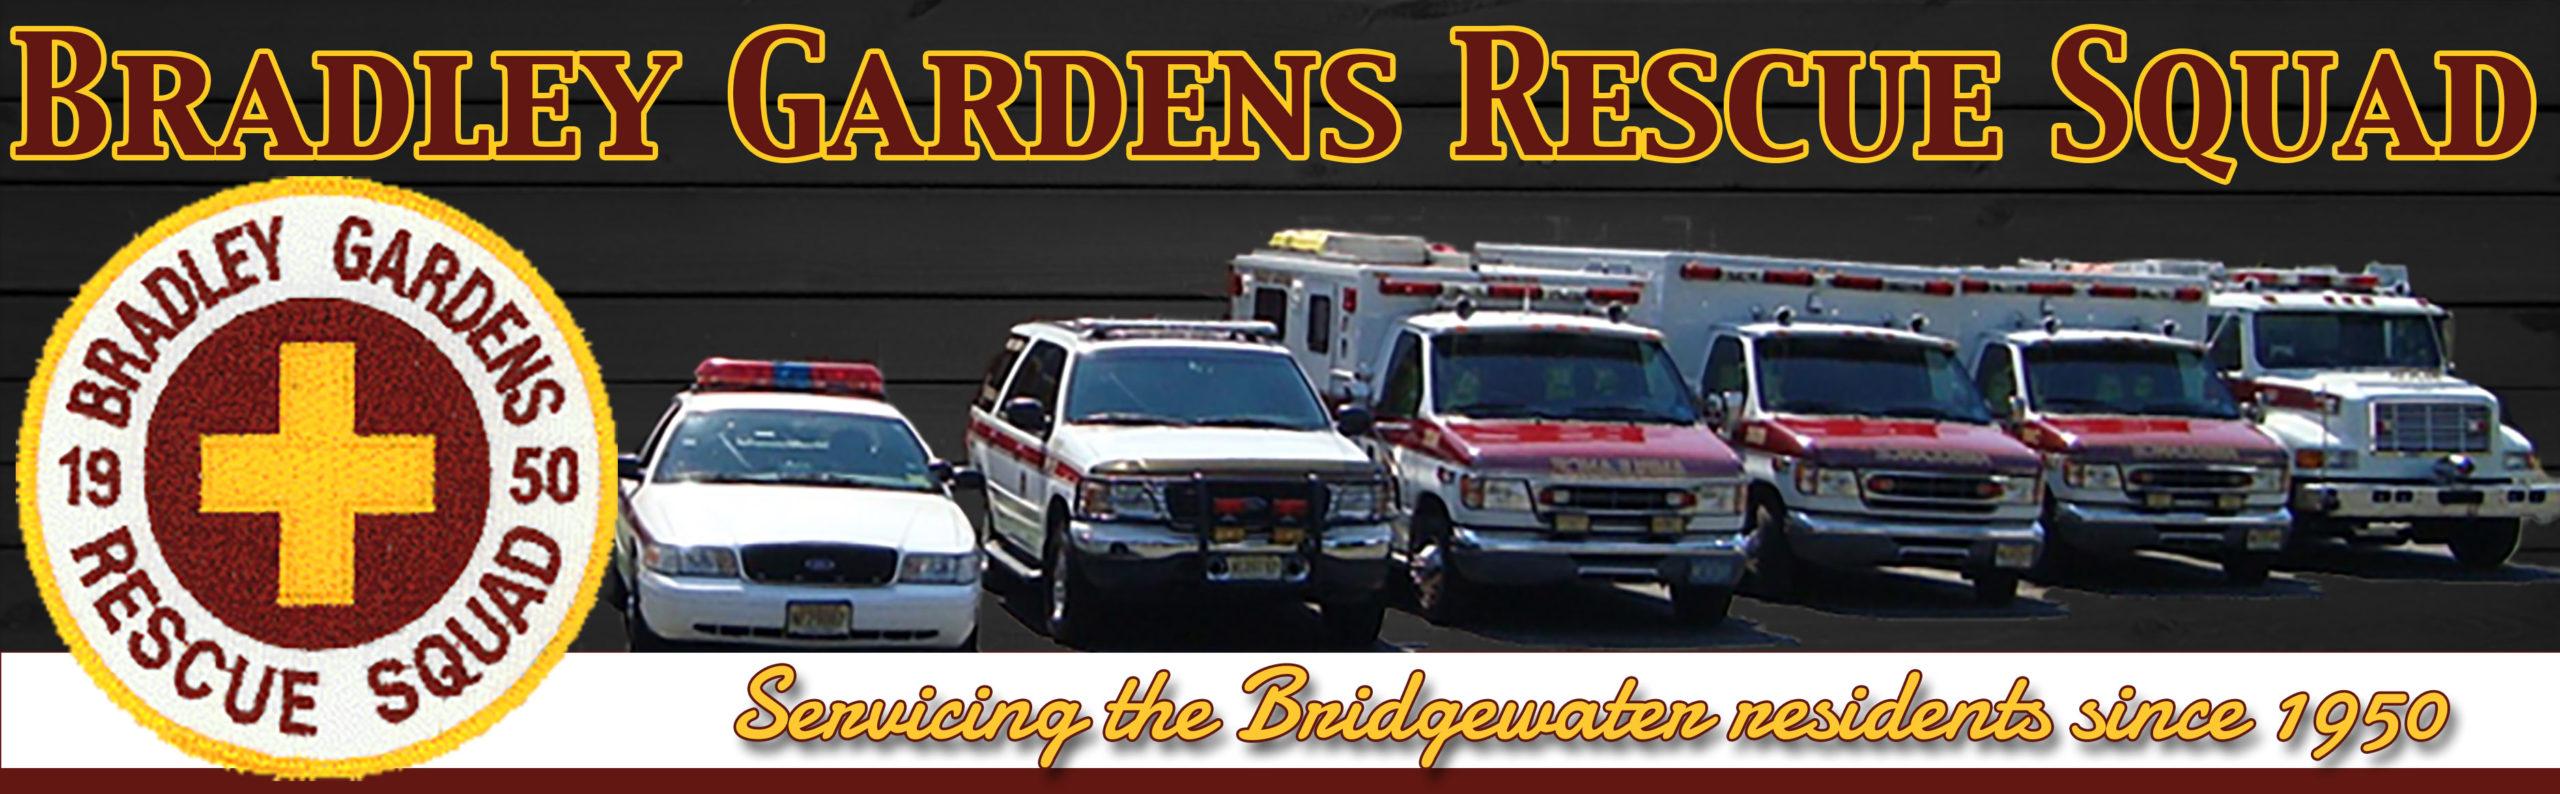 Bradley Gardens Rescue Squad